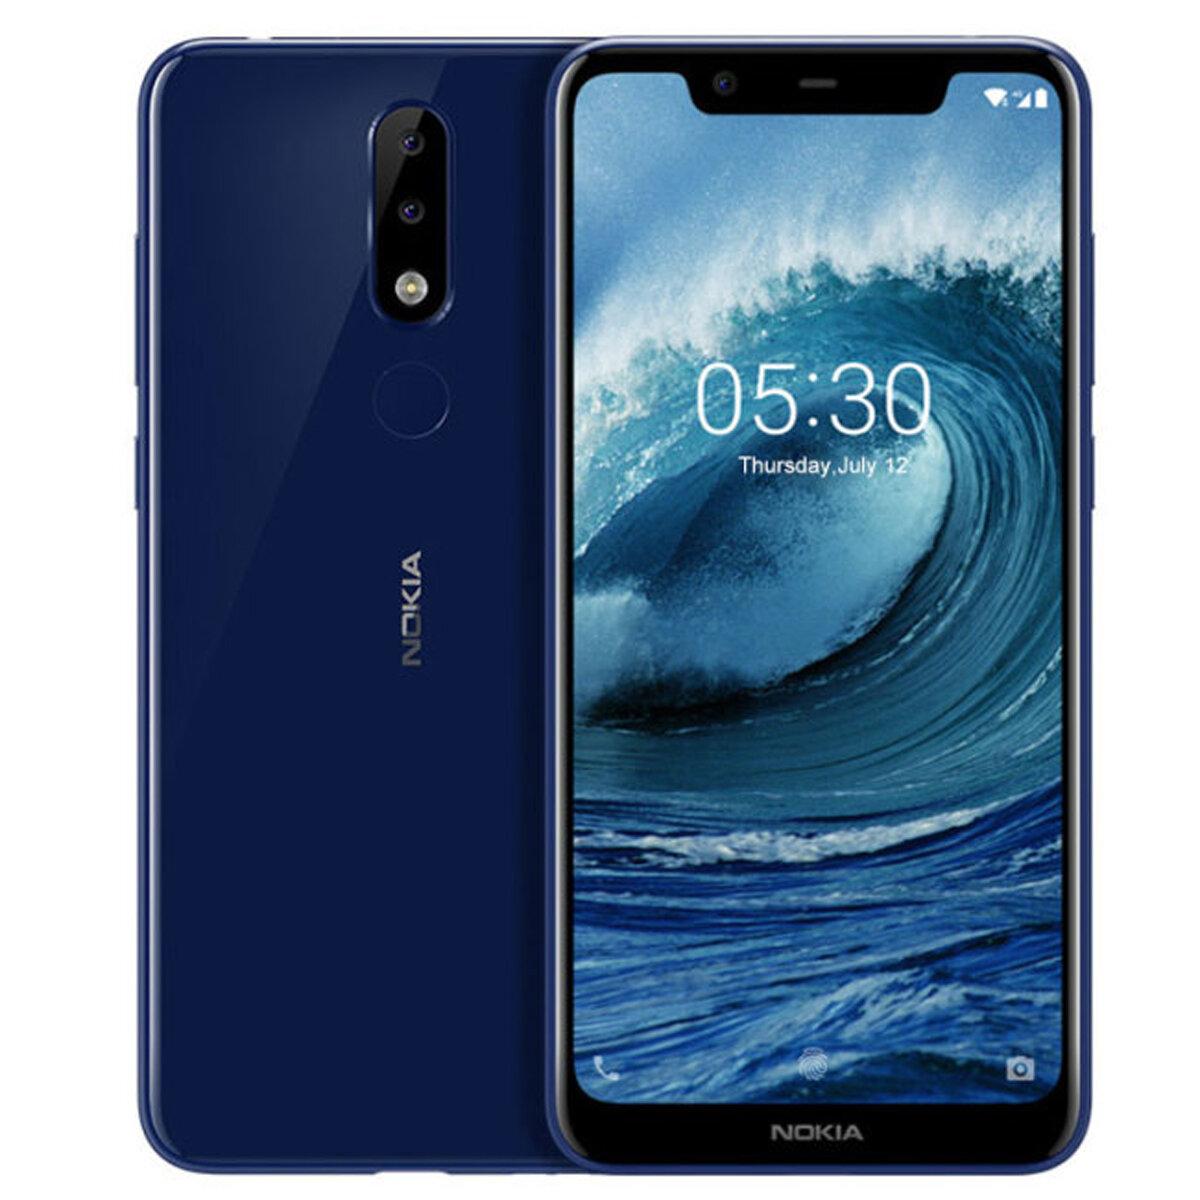 NOKIA X5 5.89 inch Android 8.1 Fingerprint 3GB RAM 32GB ROM Helio P60 Octa Core 4G Smartphone